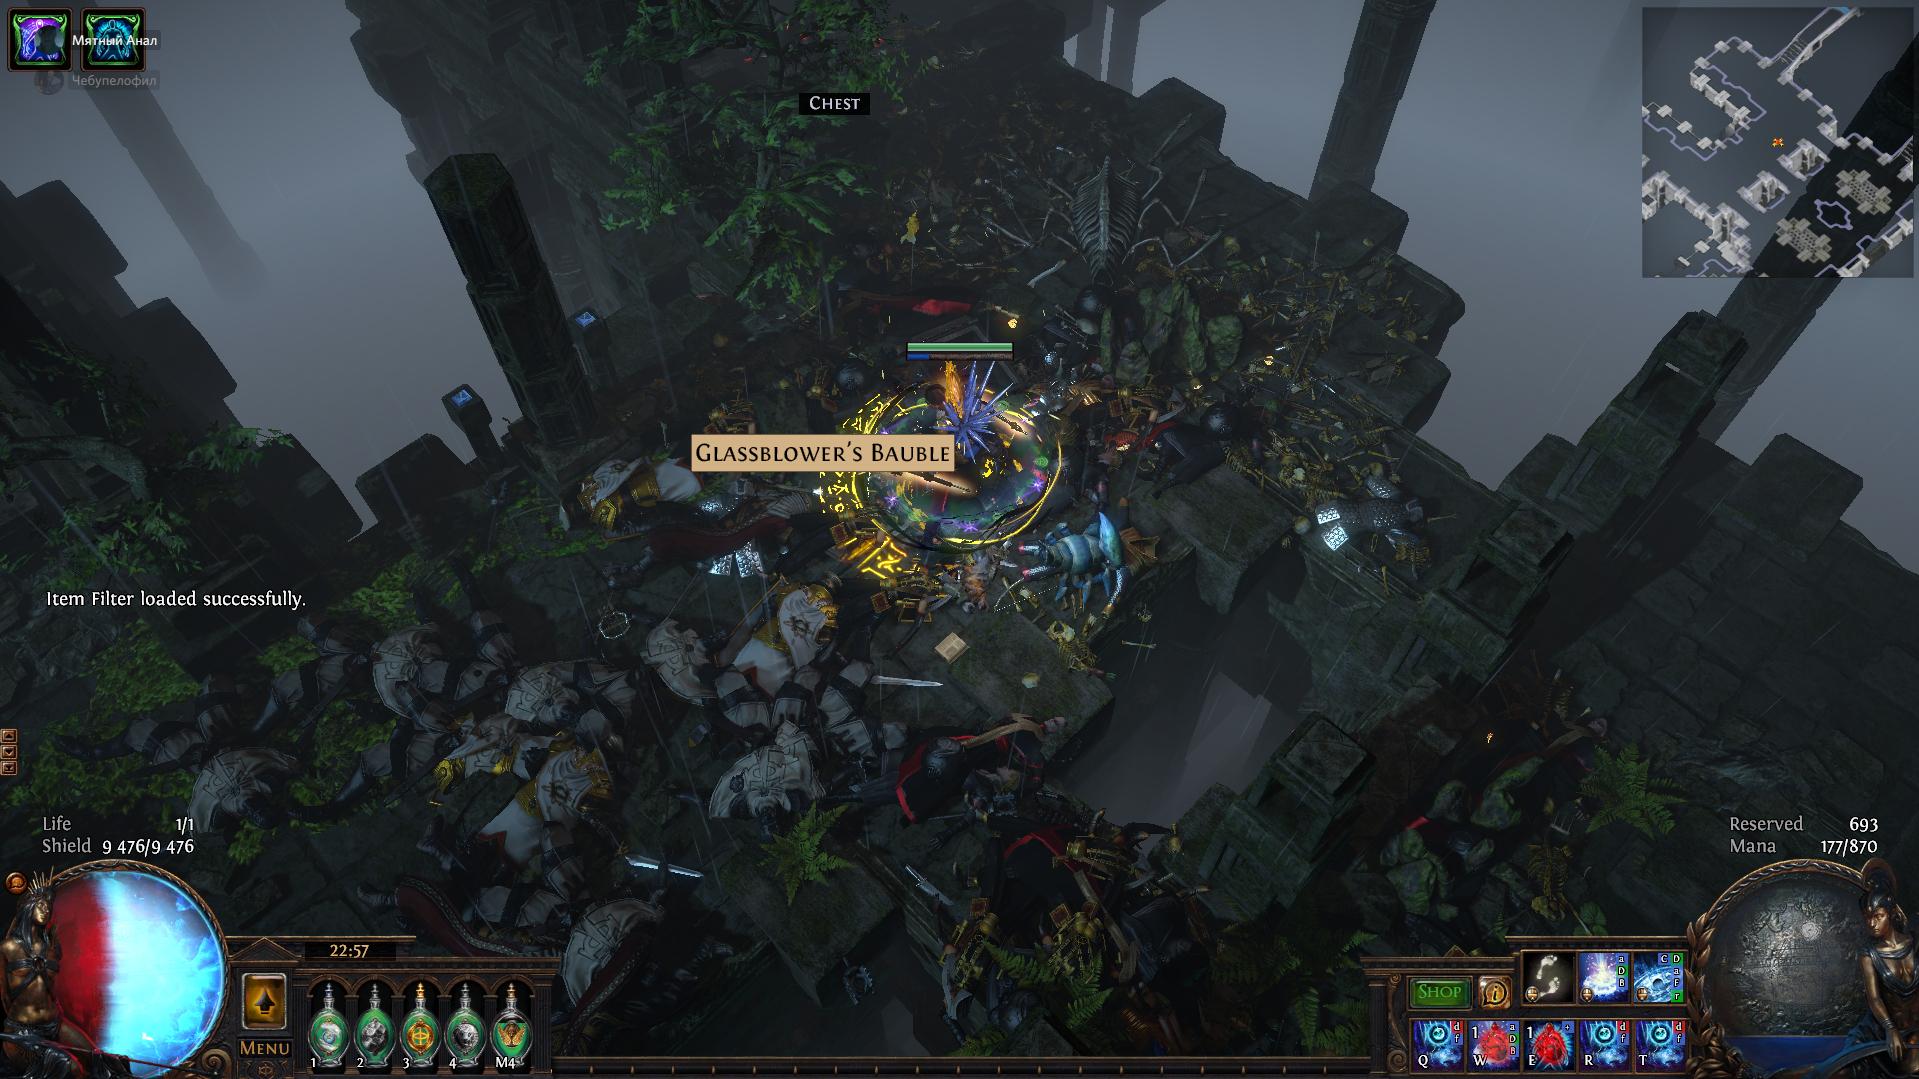 Steam Community :: Guide :: Гайд для новичков по Path of